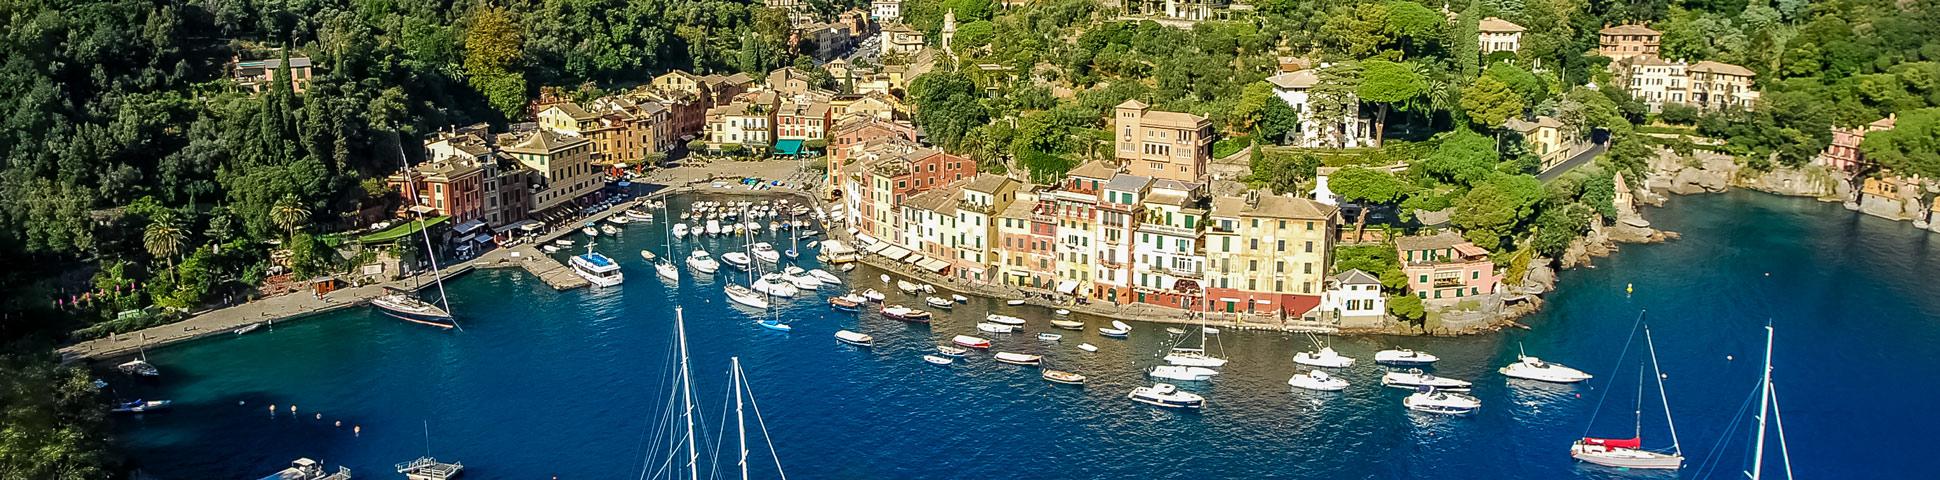 Panoramic views from Cinque Terre Portofino to Porte Venere Trek